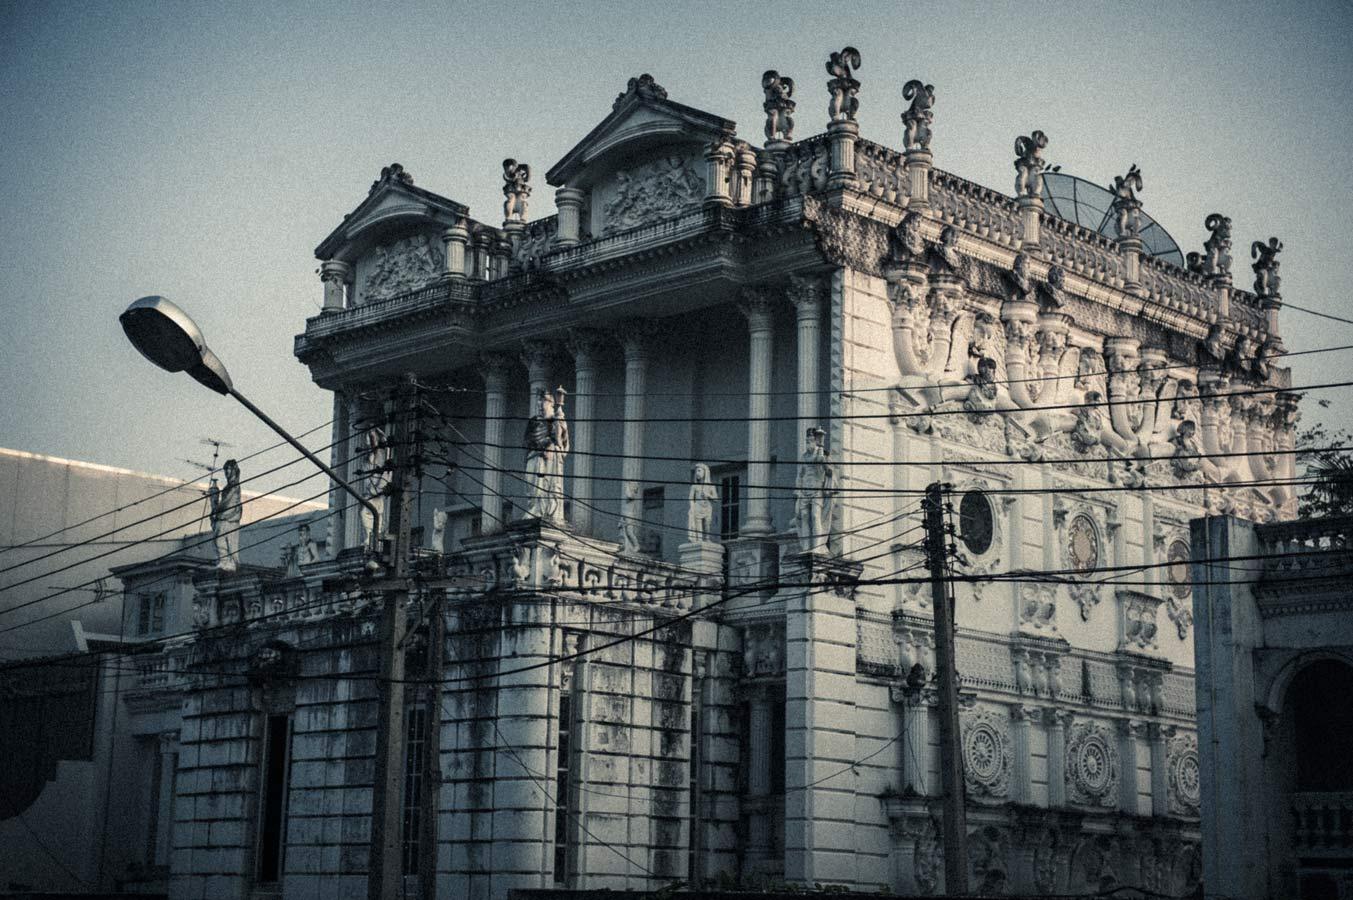 Janghuarinnakorn House (or The White Lion Mansion), Chiang Mai.